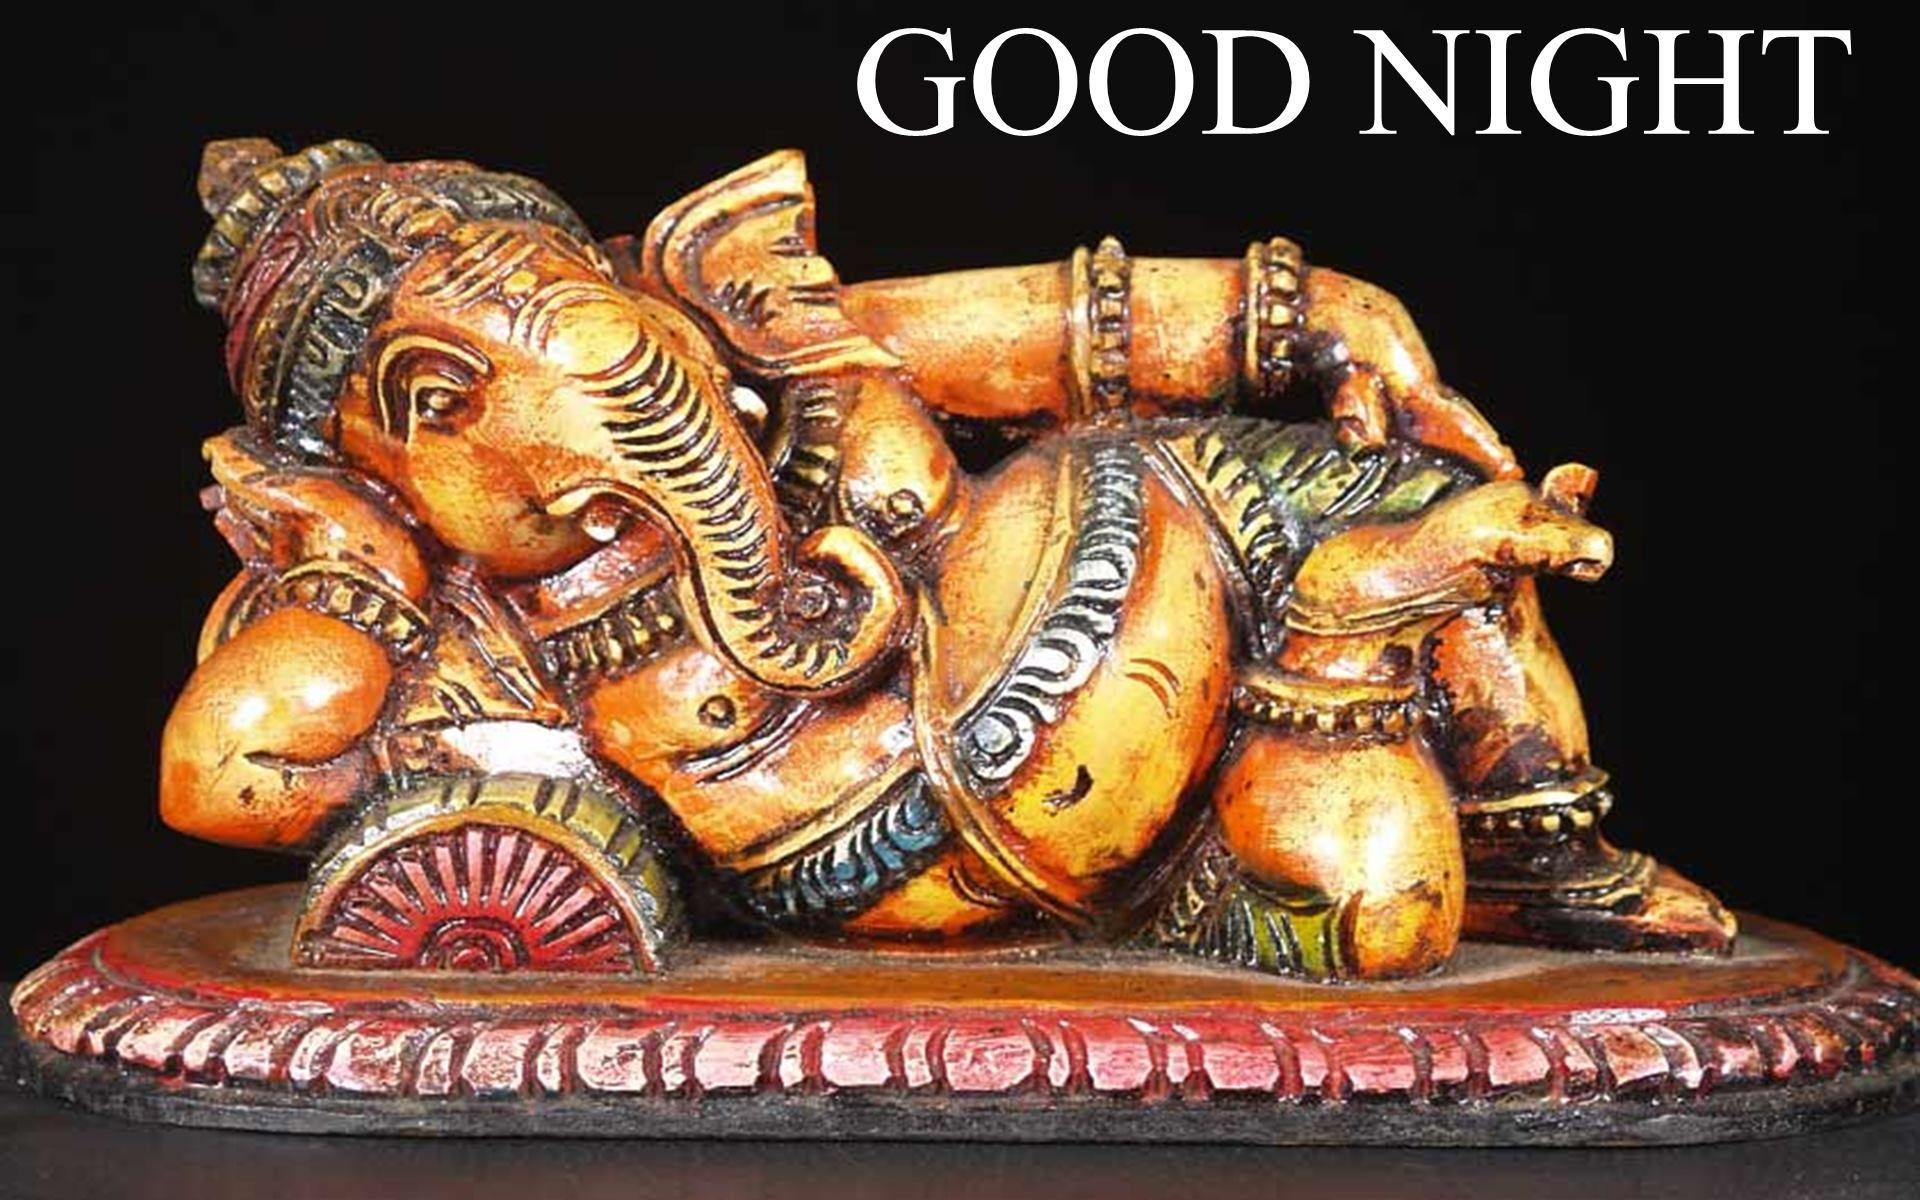 Popular Wallpaper Night God - 63eda51f0225f0a6f3aee40352c67926  Snapshot-928575.jpg